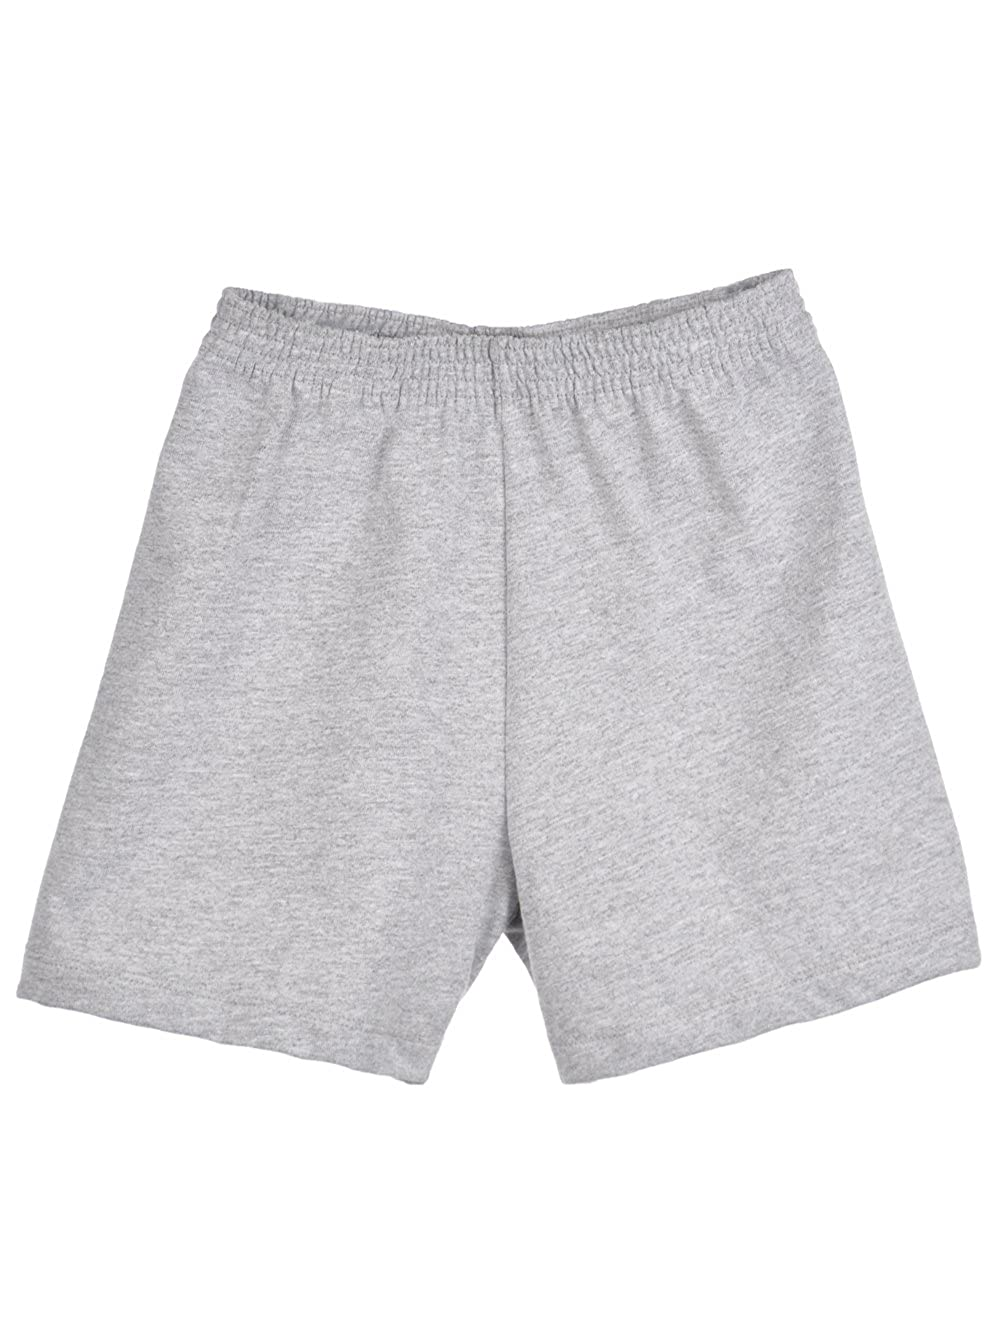 Rabbit Skins Jersey Unisex Gym Shorts